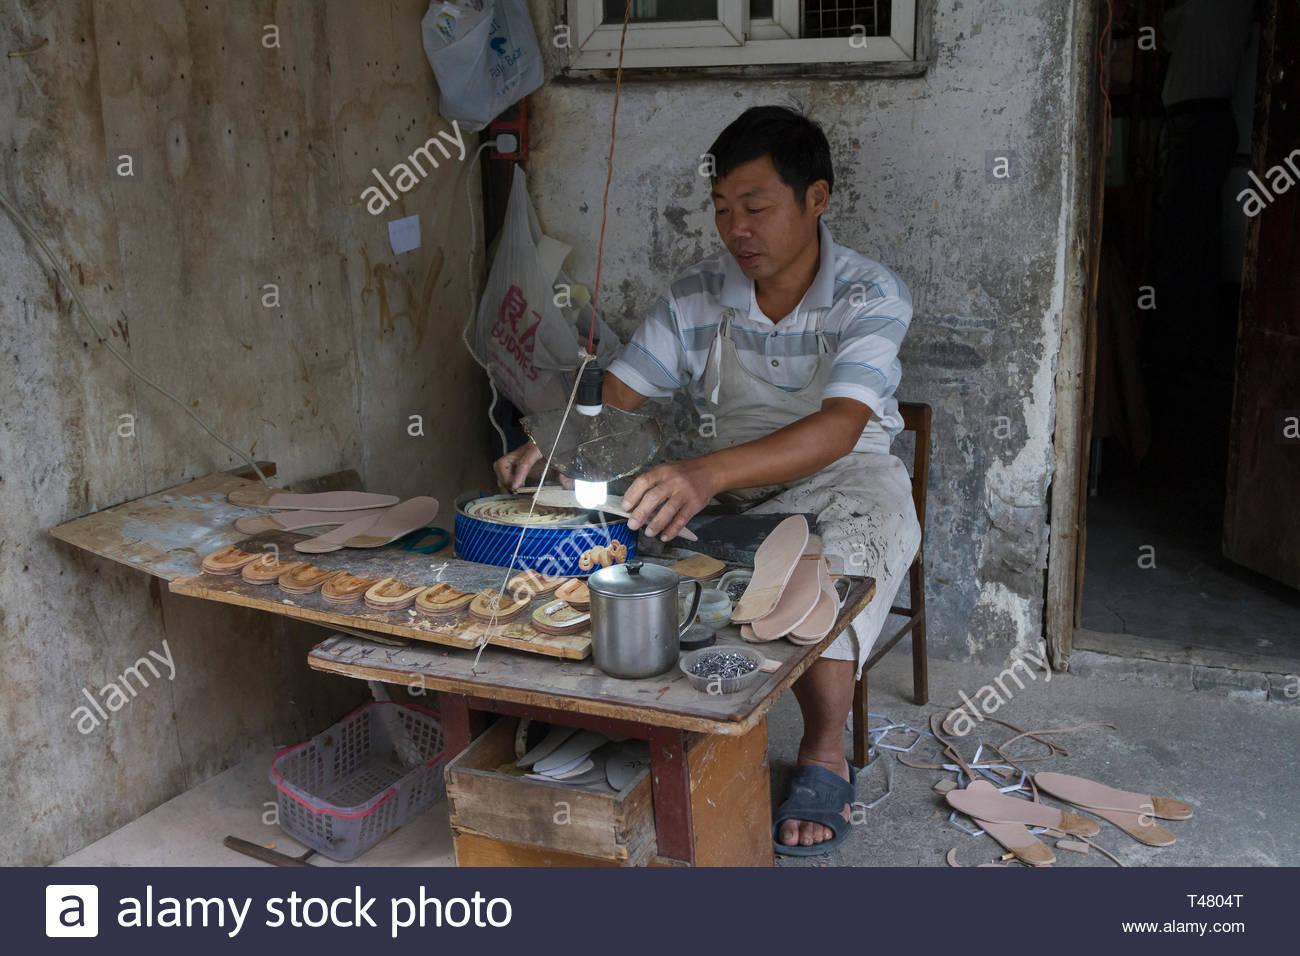 Shanghai Street Scenes - Stock Image